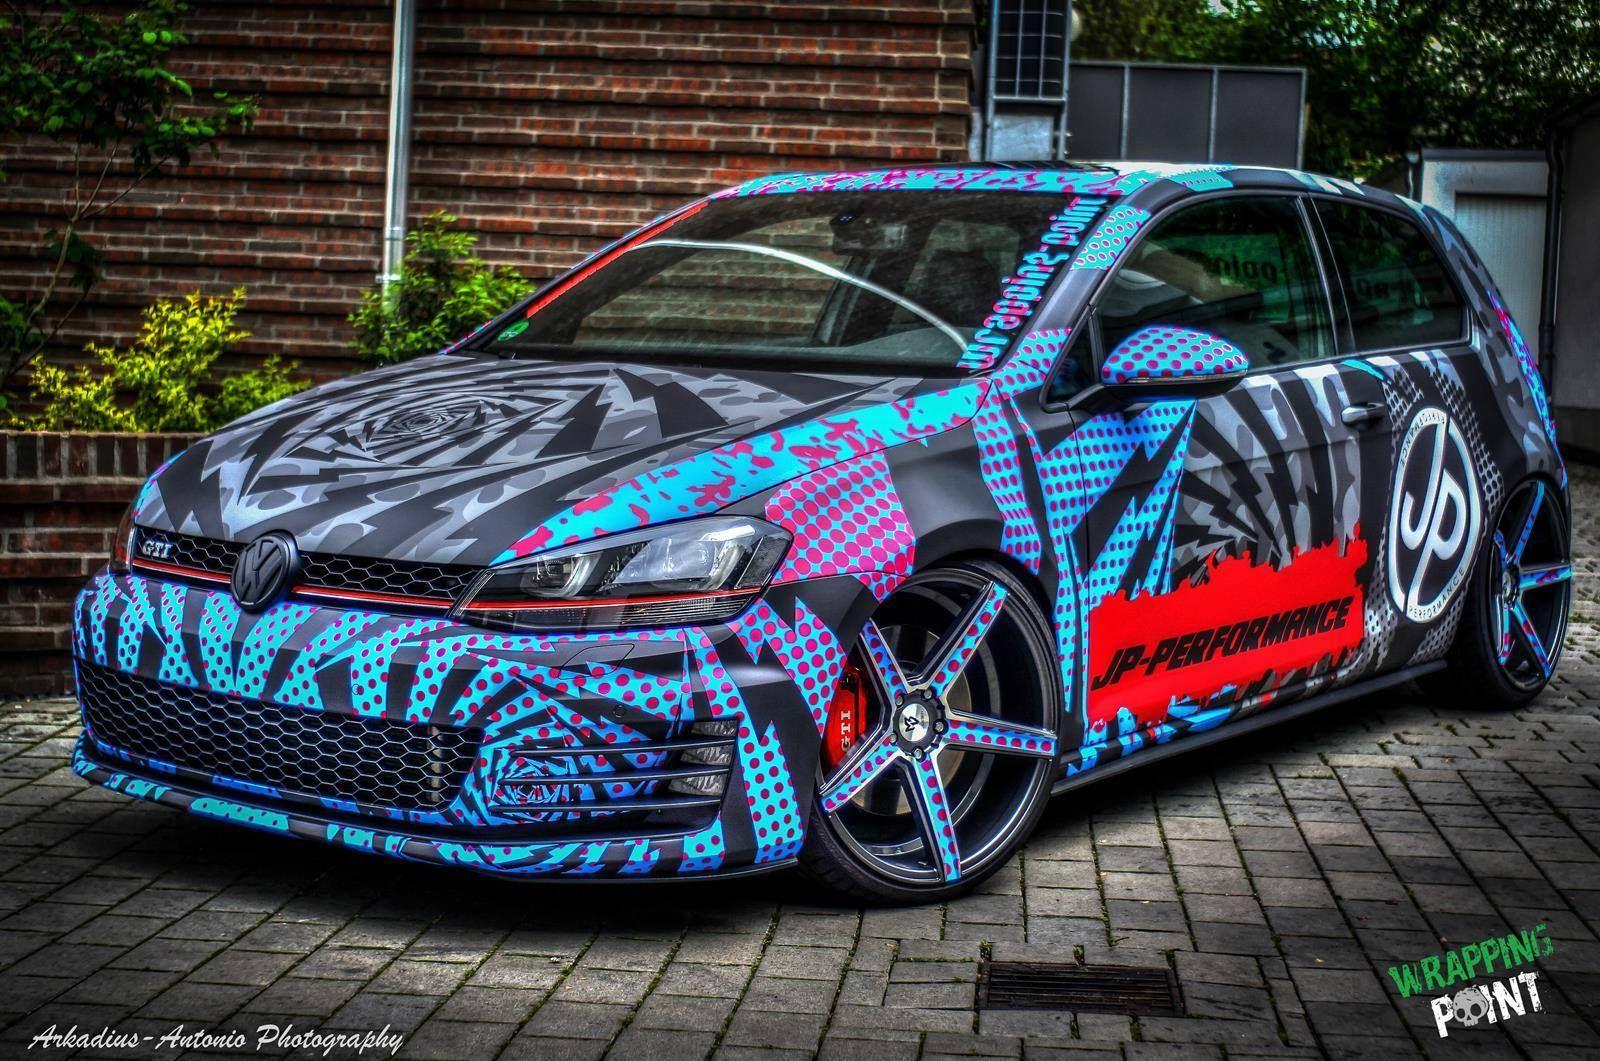 Jp performance gti wrap wrapfolio super cars gti